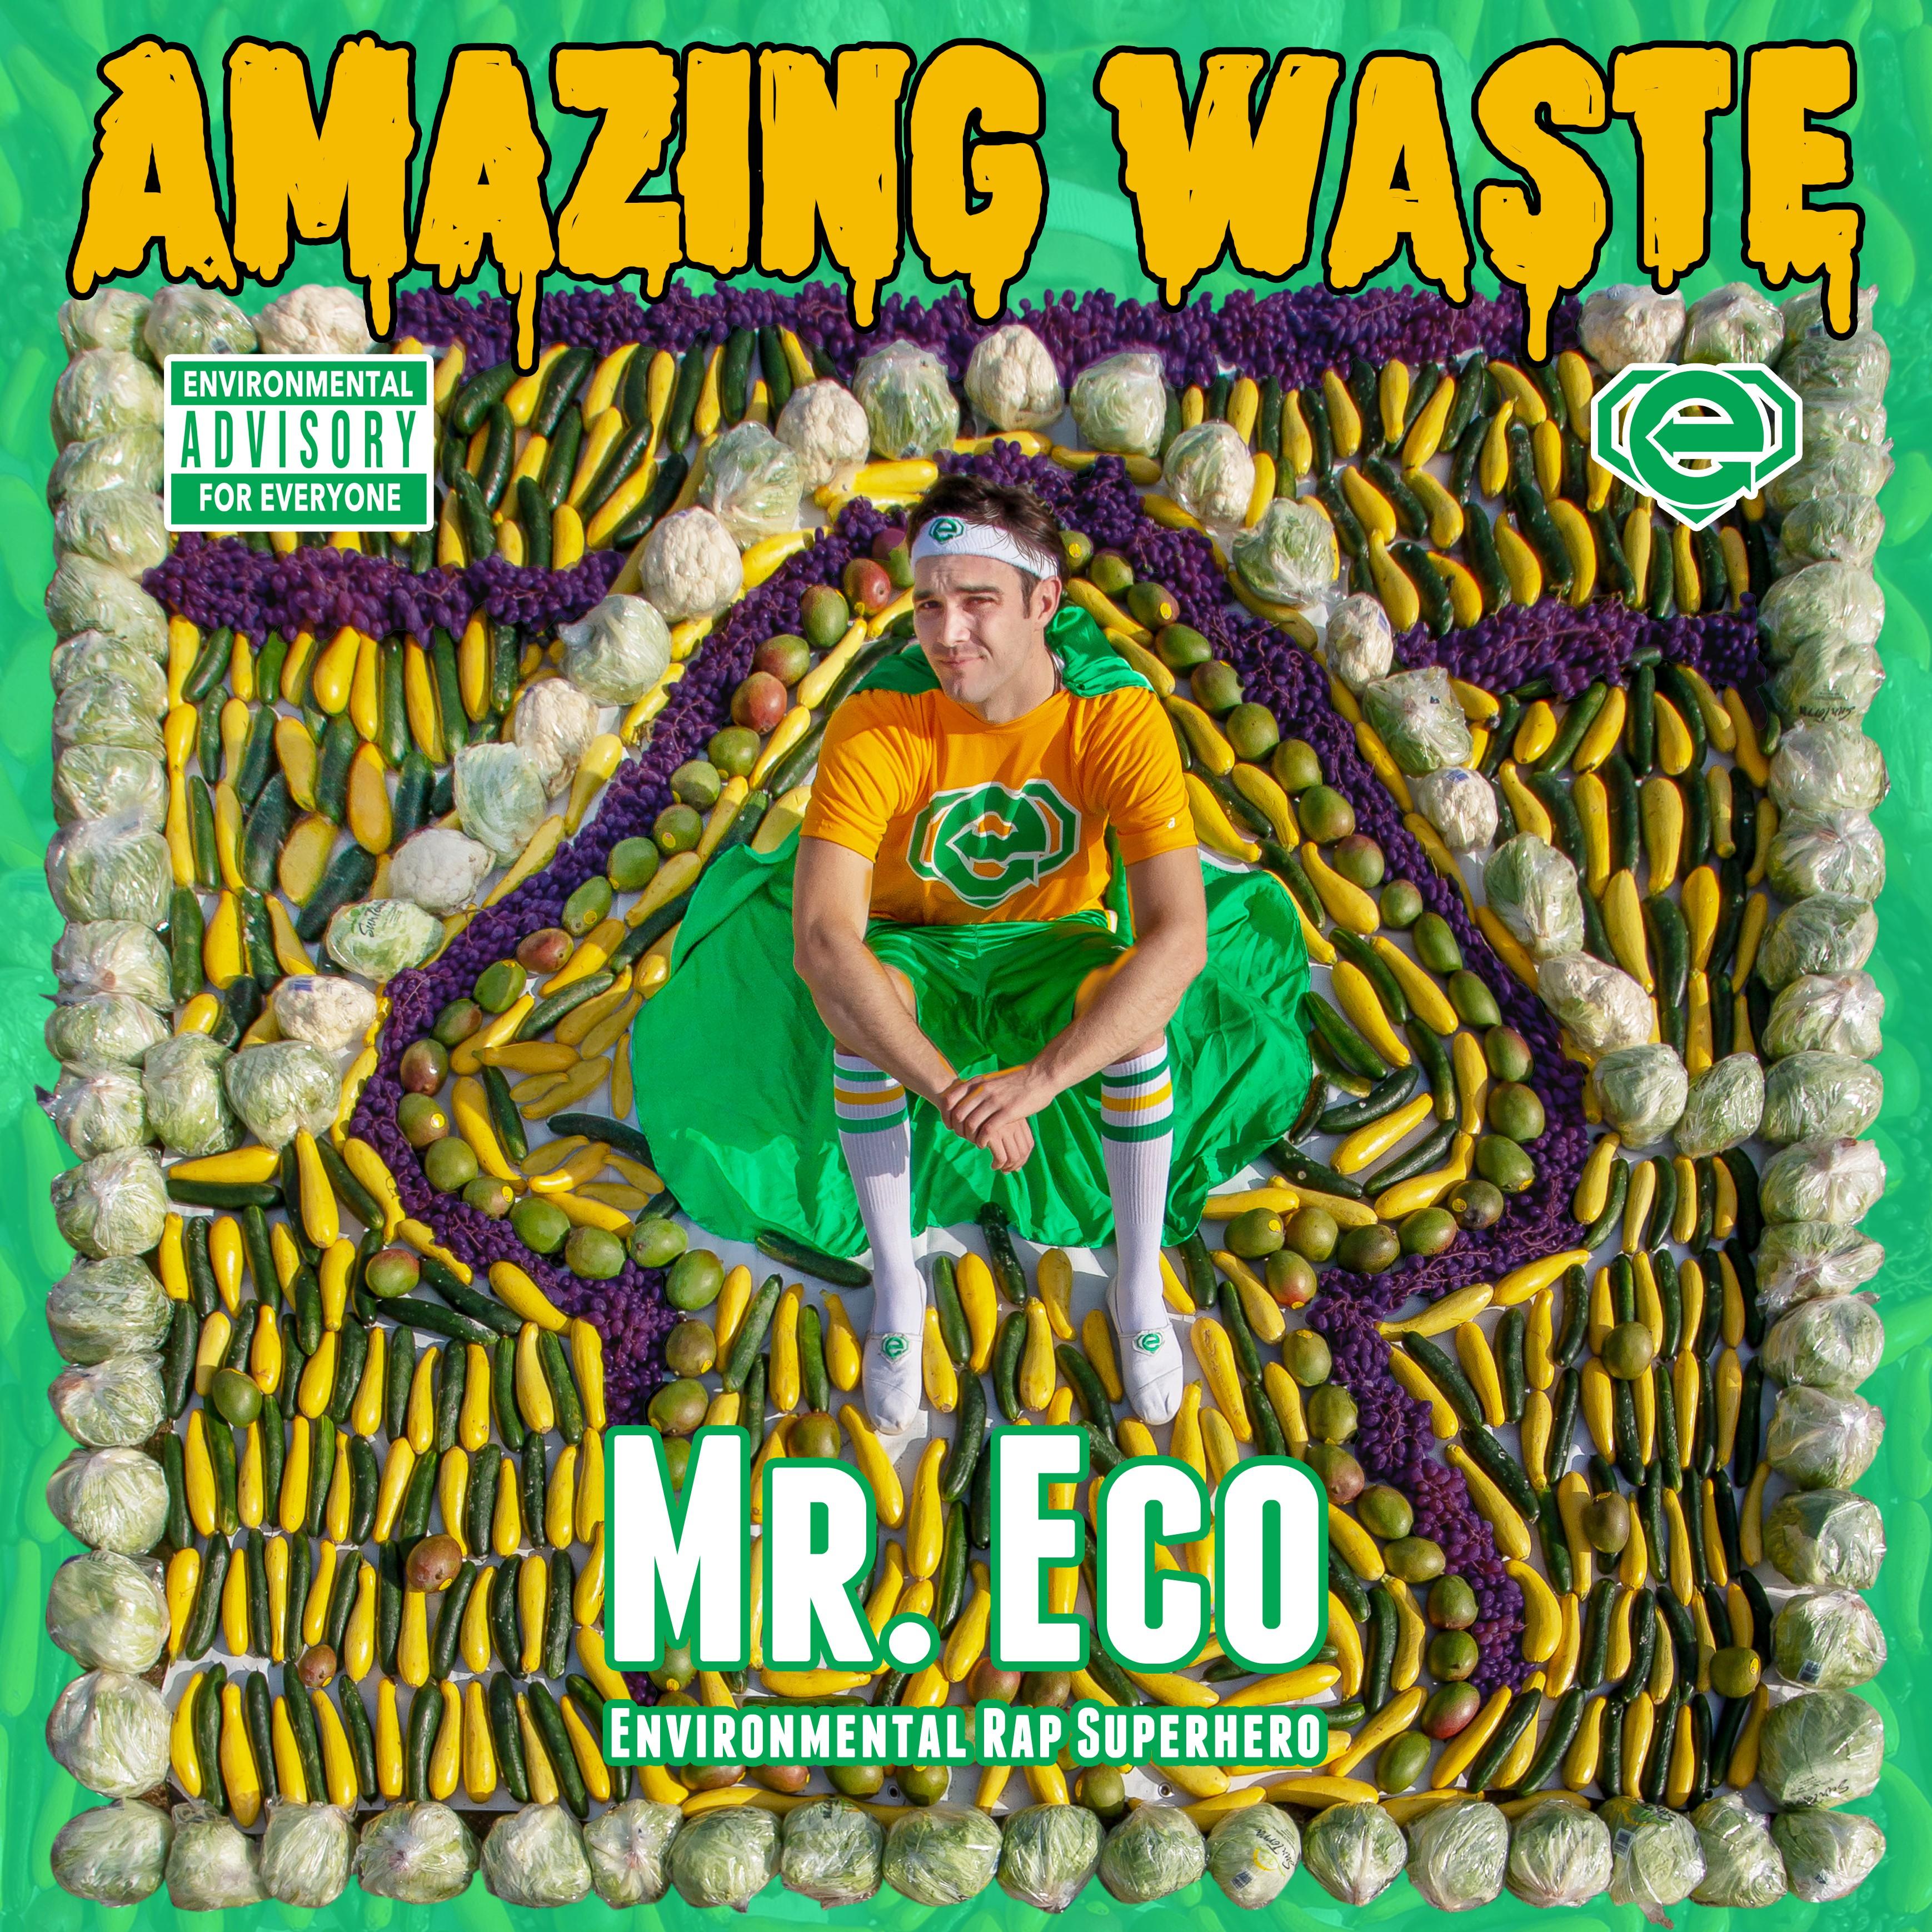 Eco Rap Superhero Food Waste Album